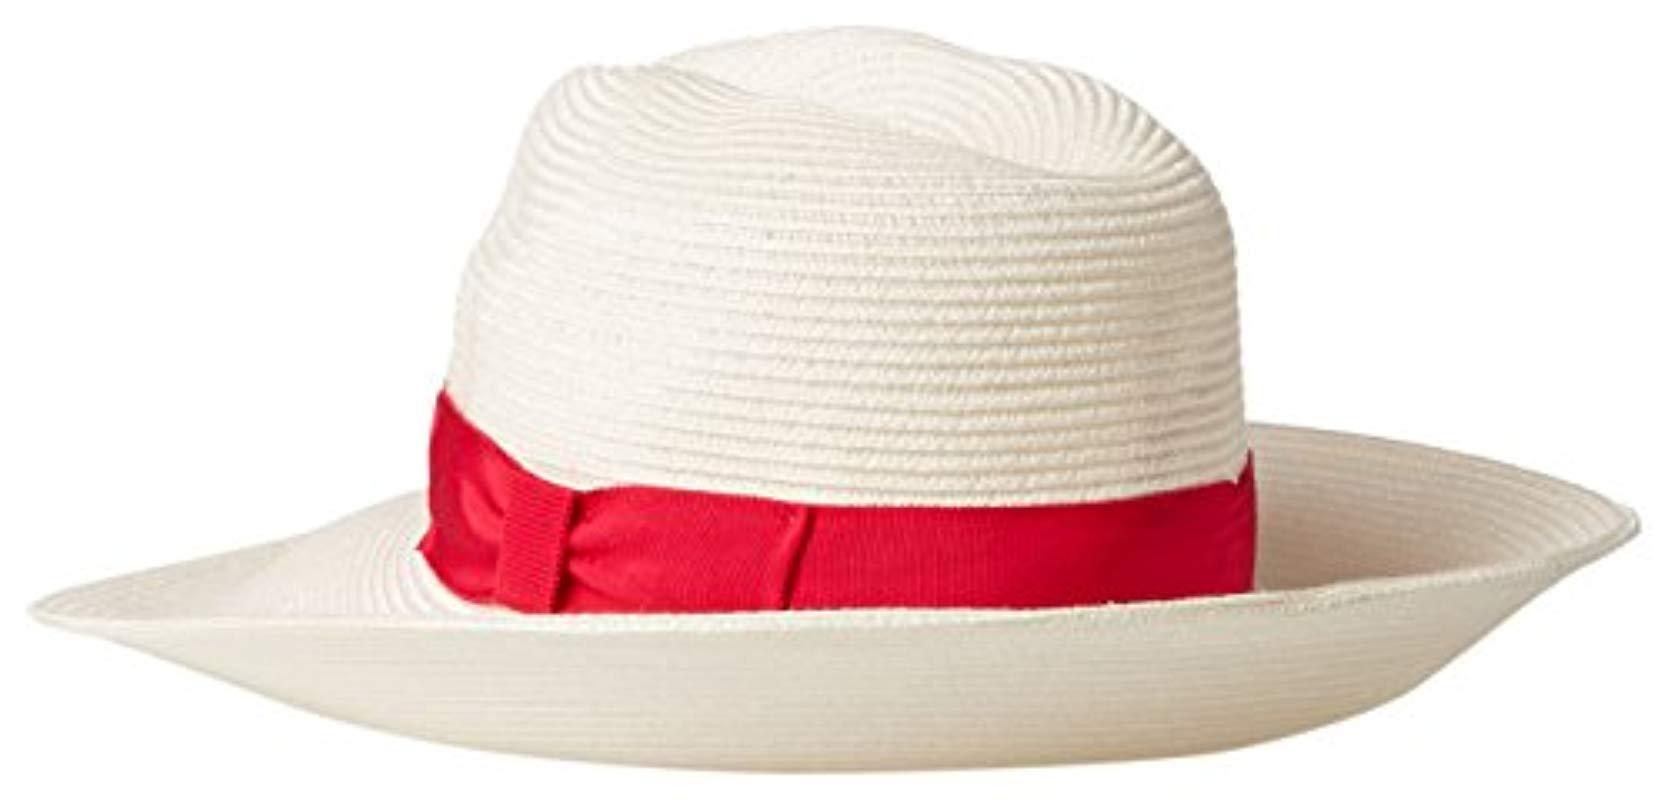 Gottex - Multicolor Alhambra Packable Fedora Sun Hat 3b431ce3be23